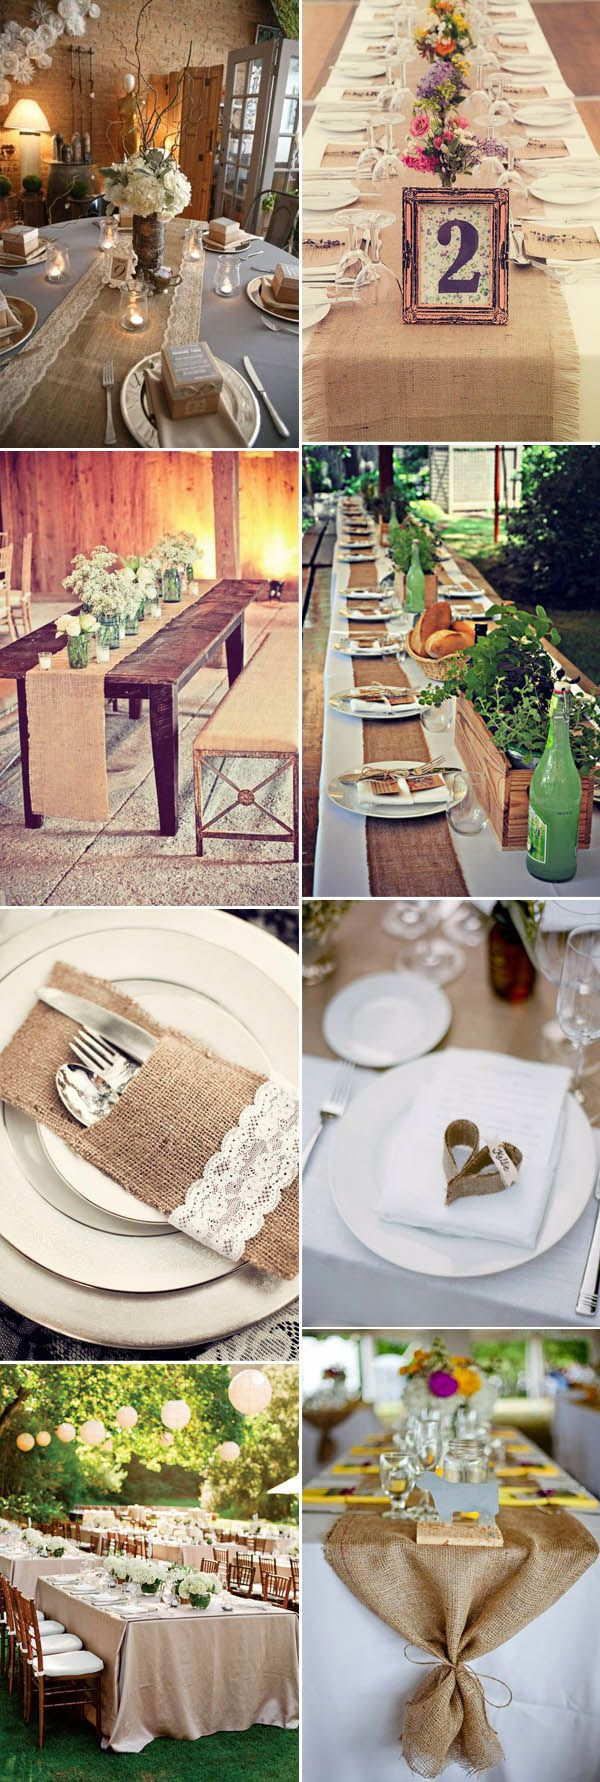 fantastic burlap and lace wedding table setting ideas